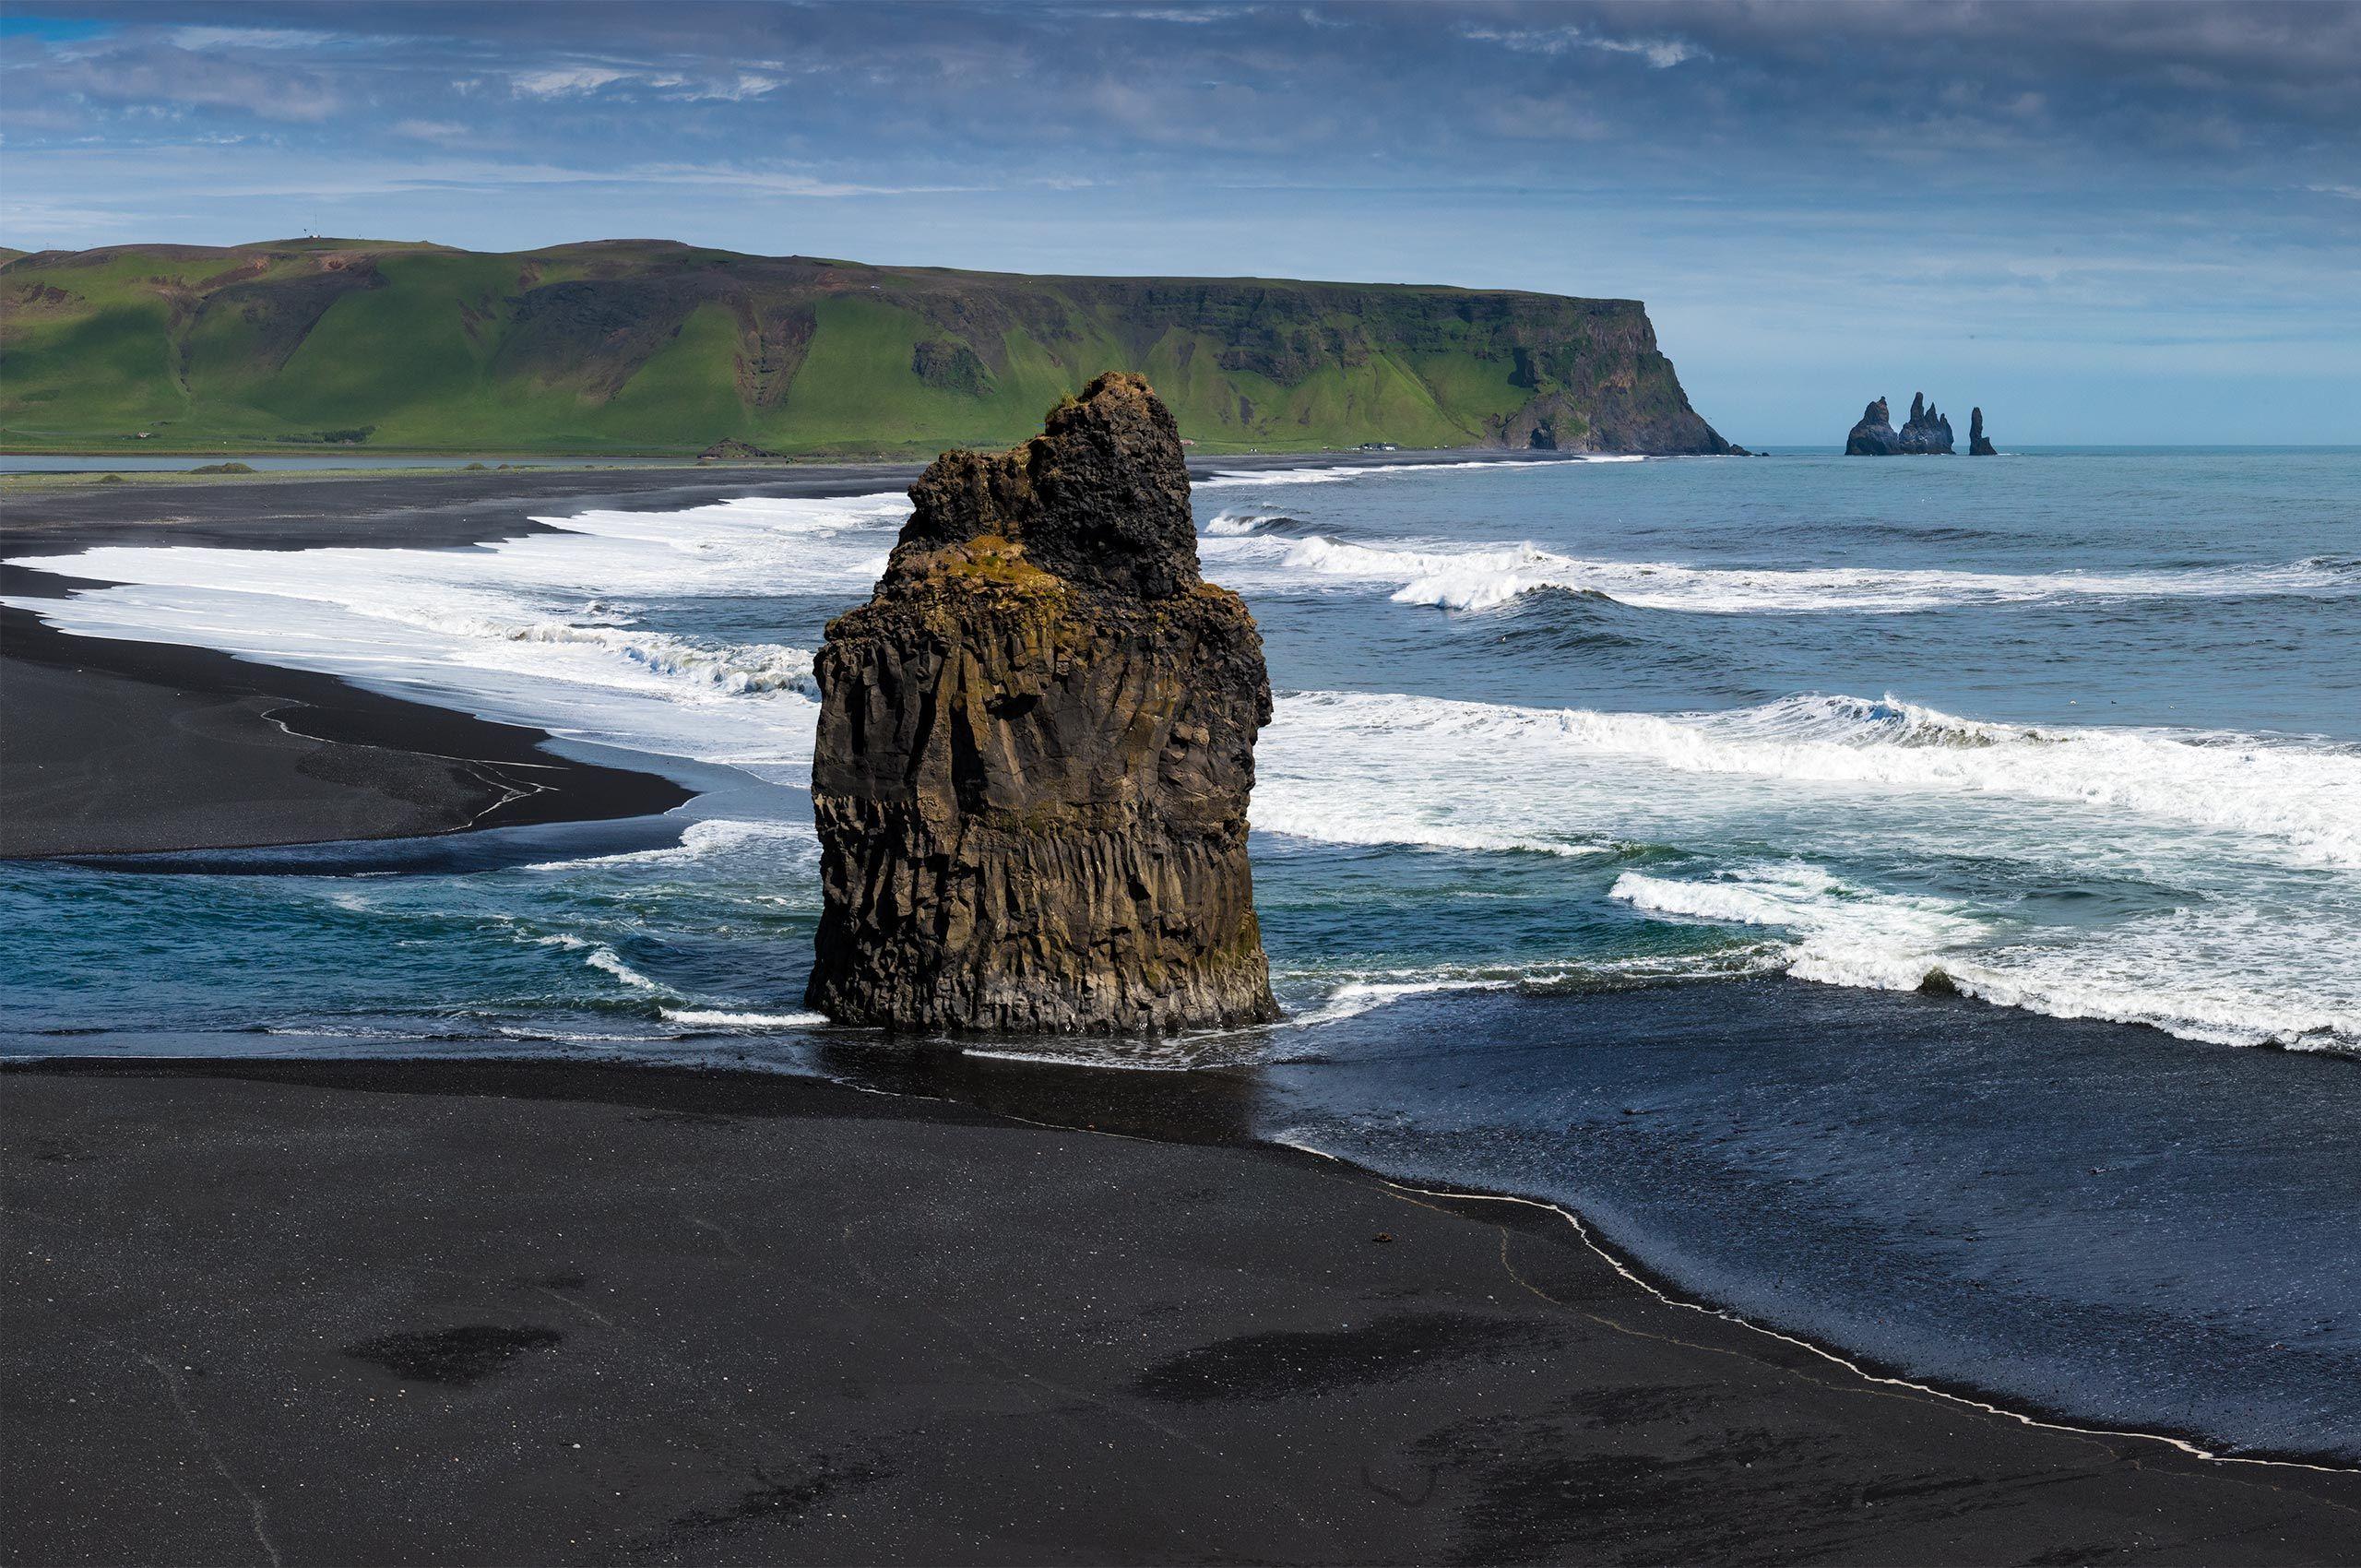 Iceland-20-D-17-06-11-7359_64-Pano-(Reynisdrangar).jpg